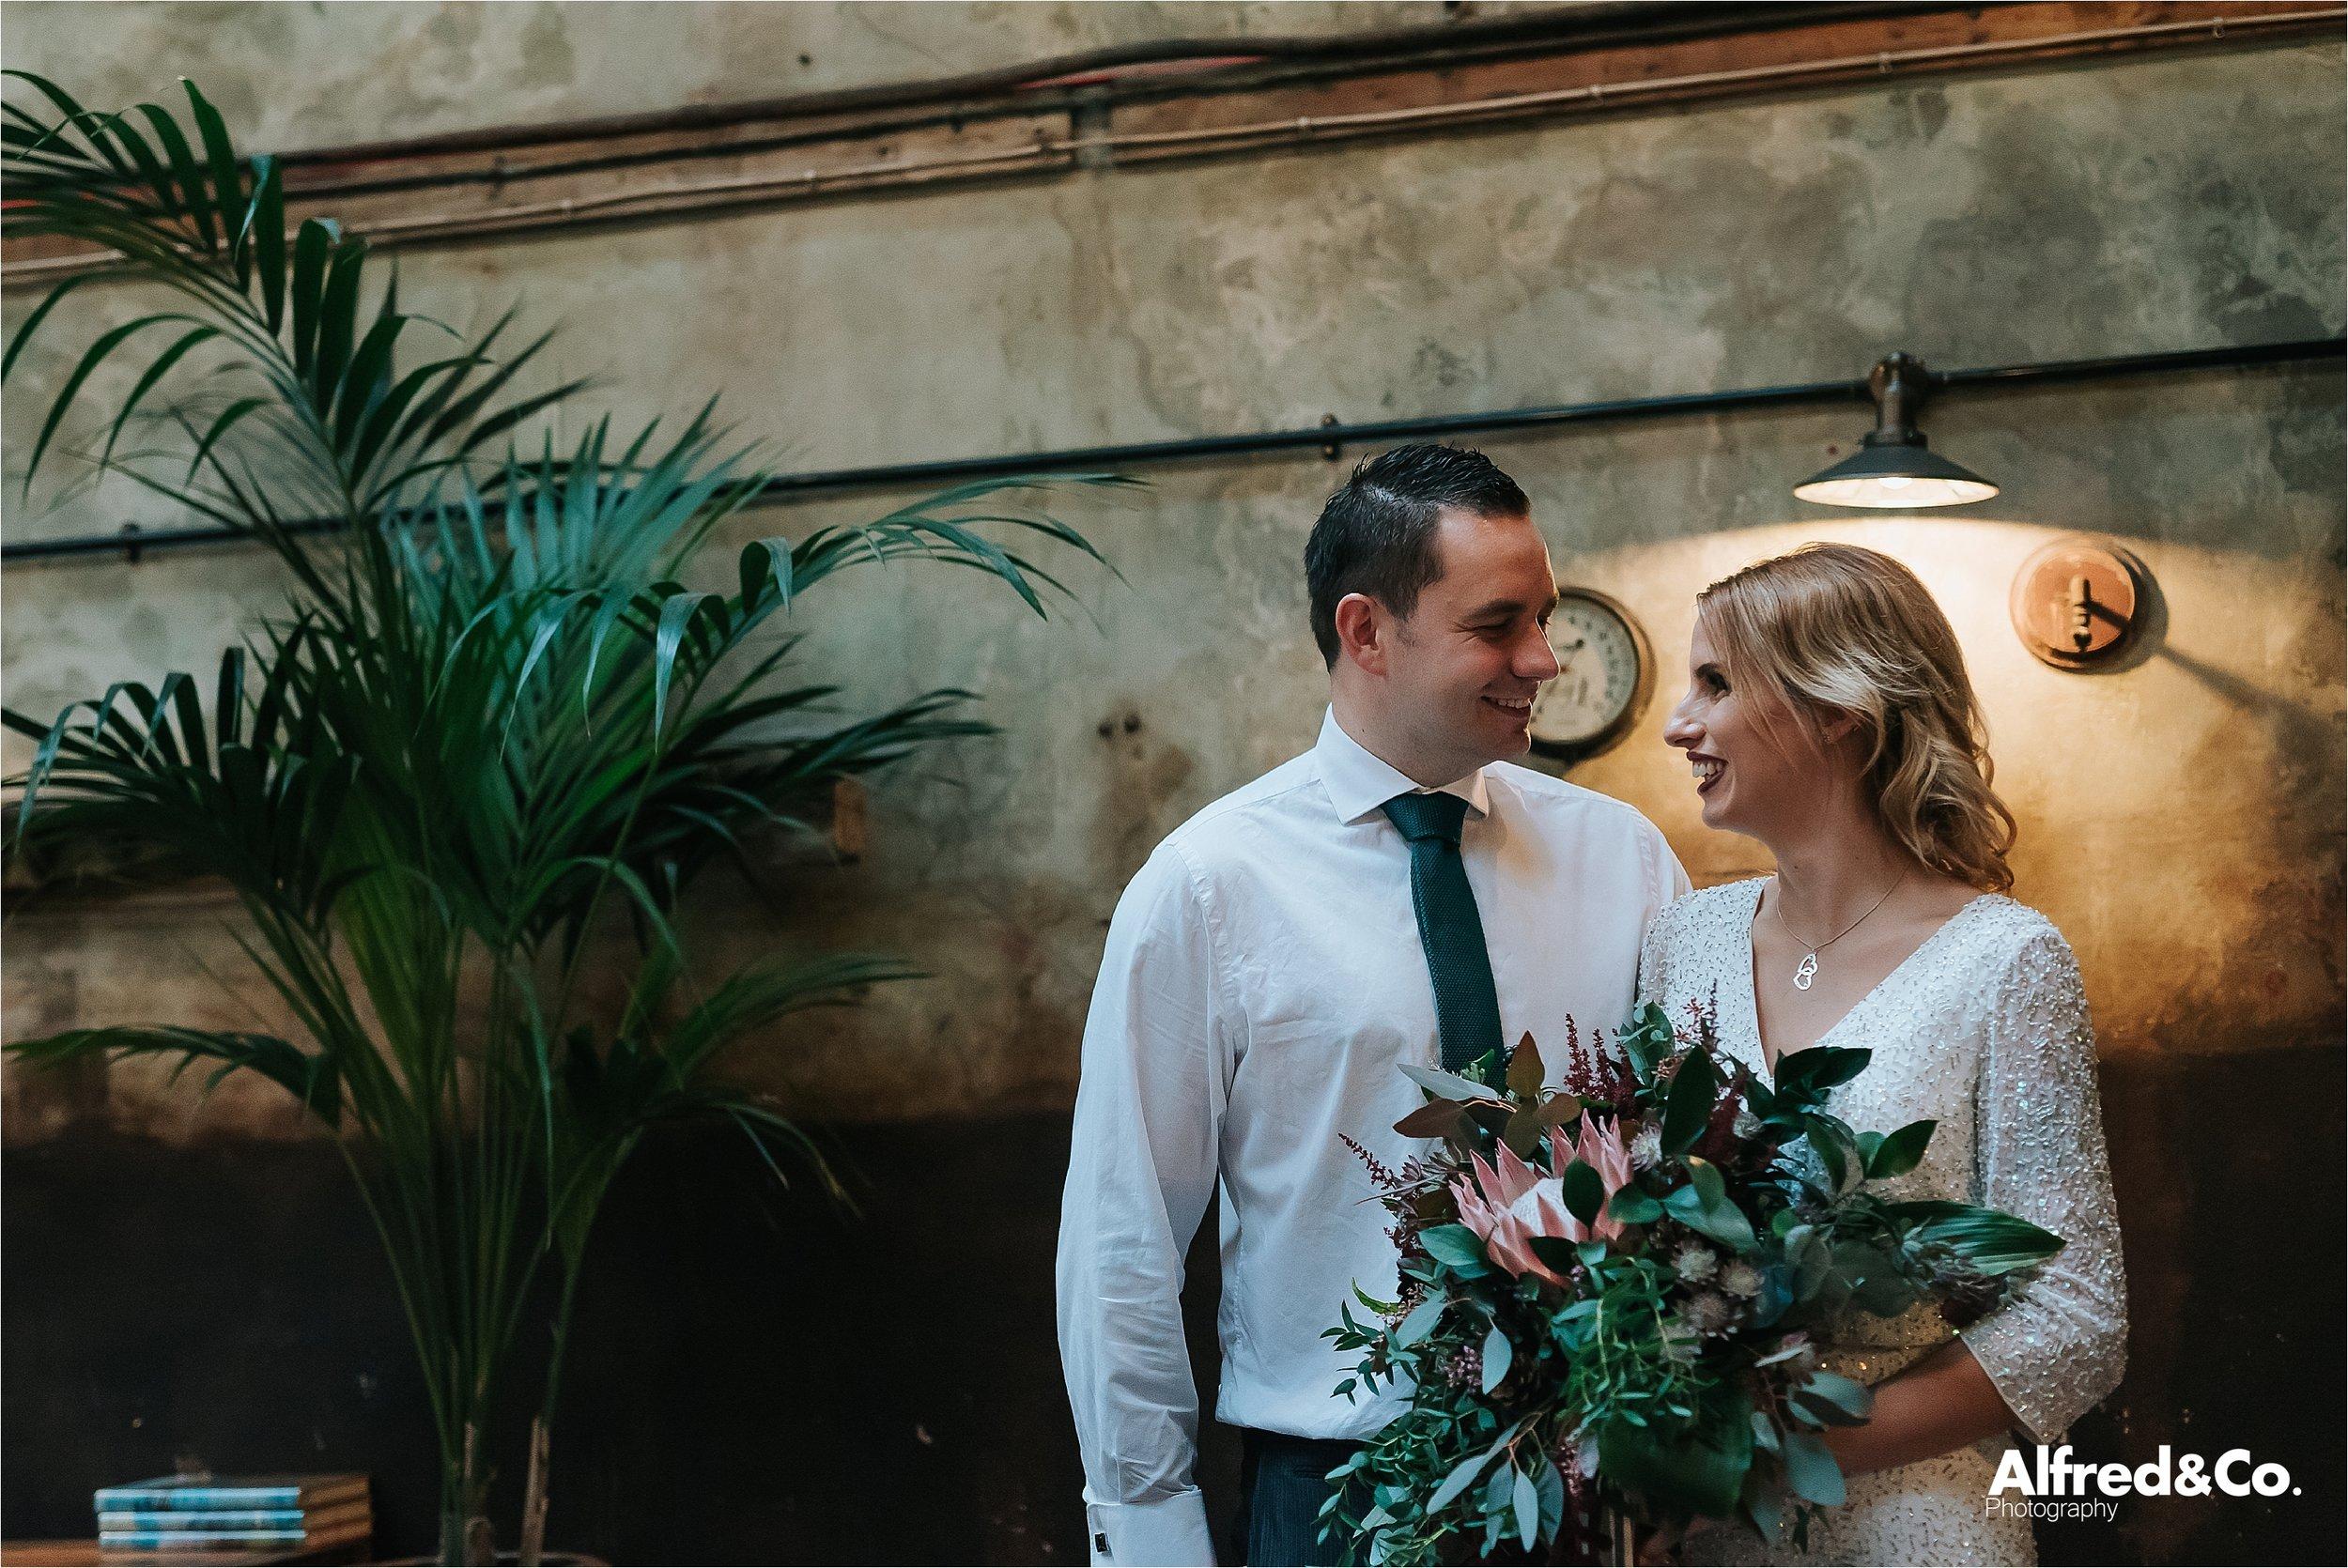 holmesmill+wedding+clitheroe+photographer+rustic+lancashire44.jpg